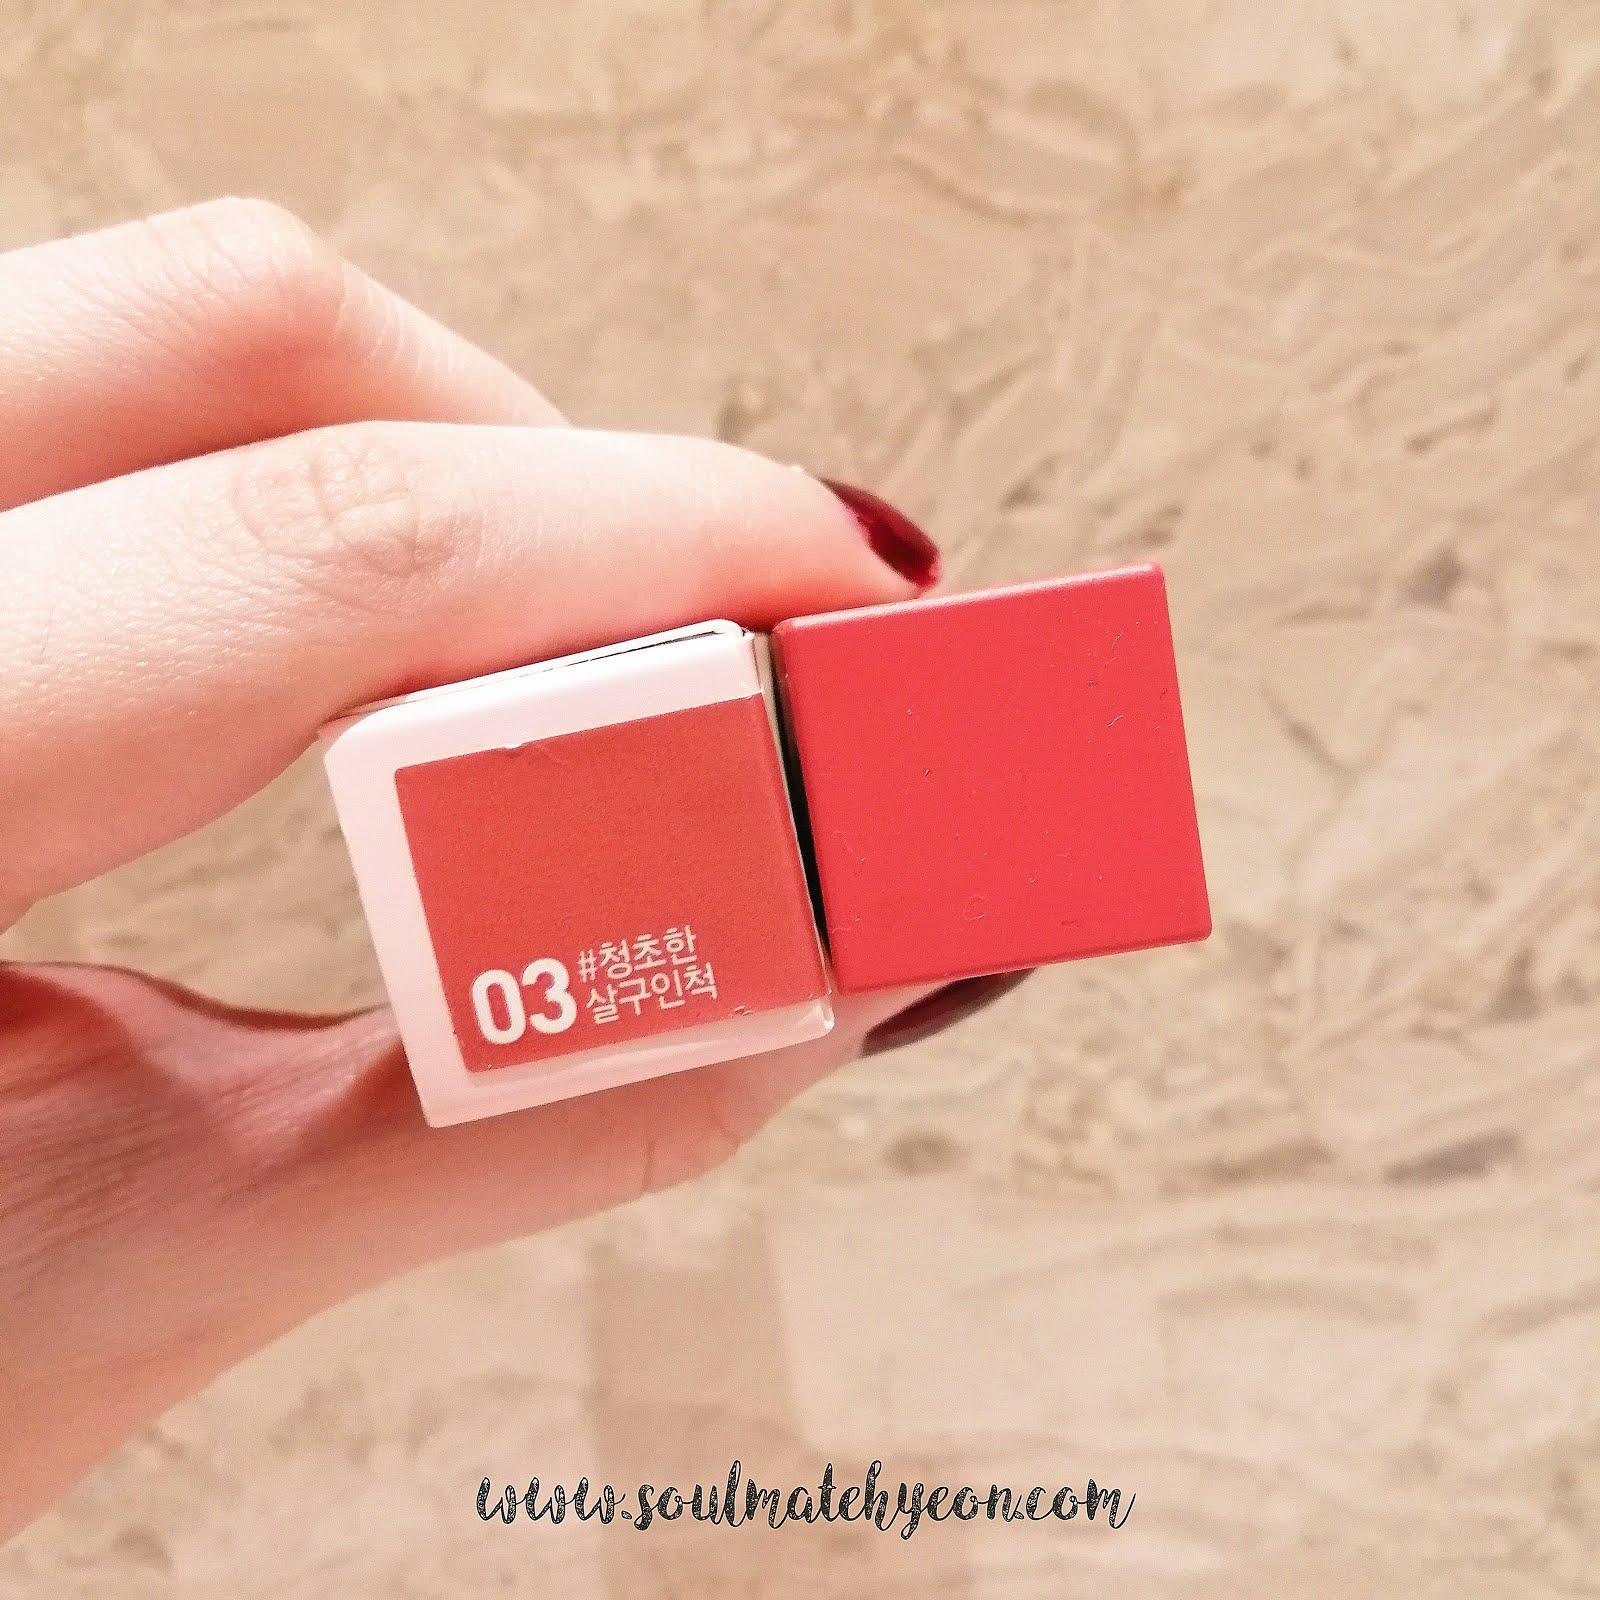 Sensible Lilybyred Mood Liar Velvet Tint 6 Color Lip Color Cosmetic Mlbb Other Lip Makeup